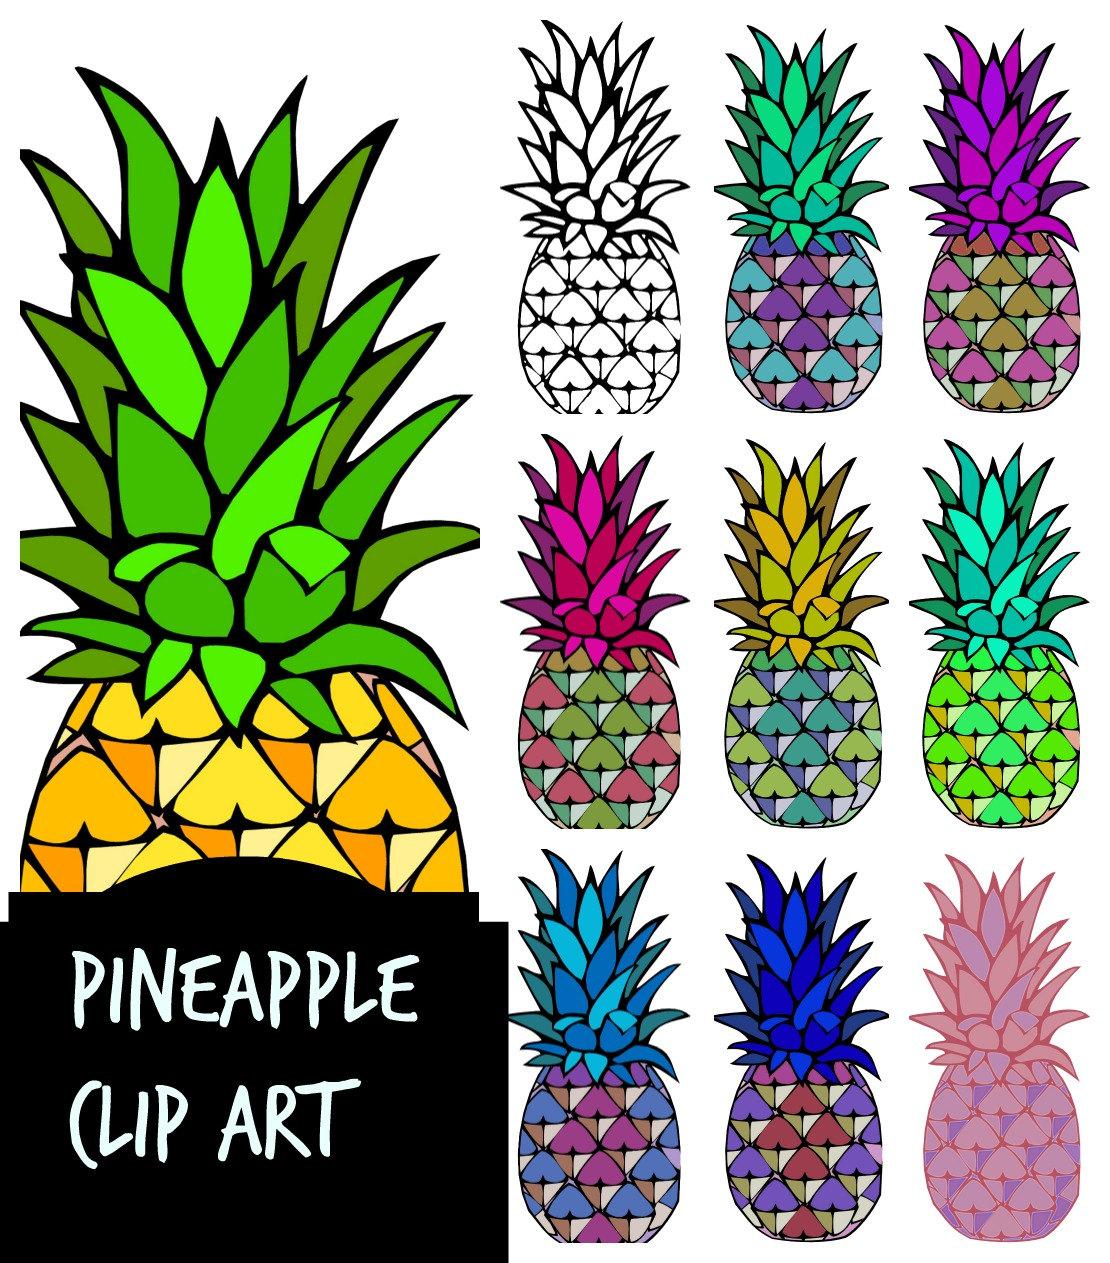 Color clipart pineapple Art clip Pineapples aqua pink